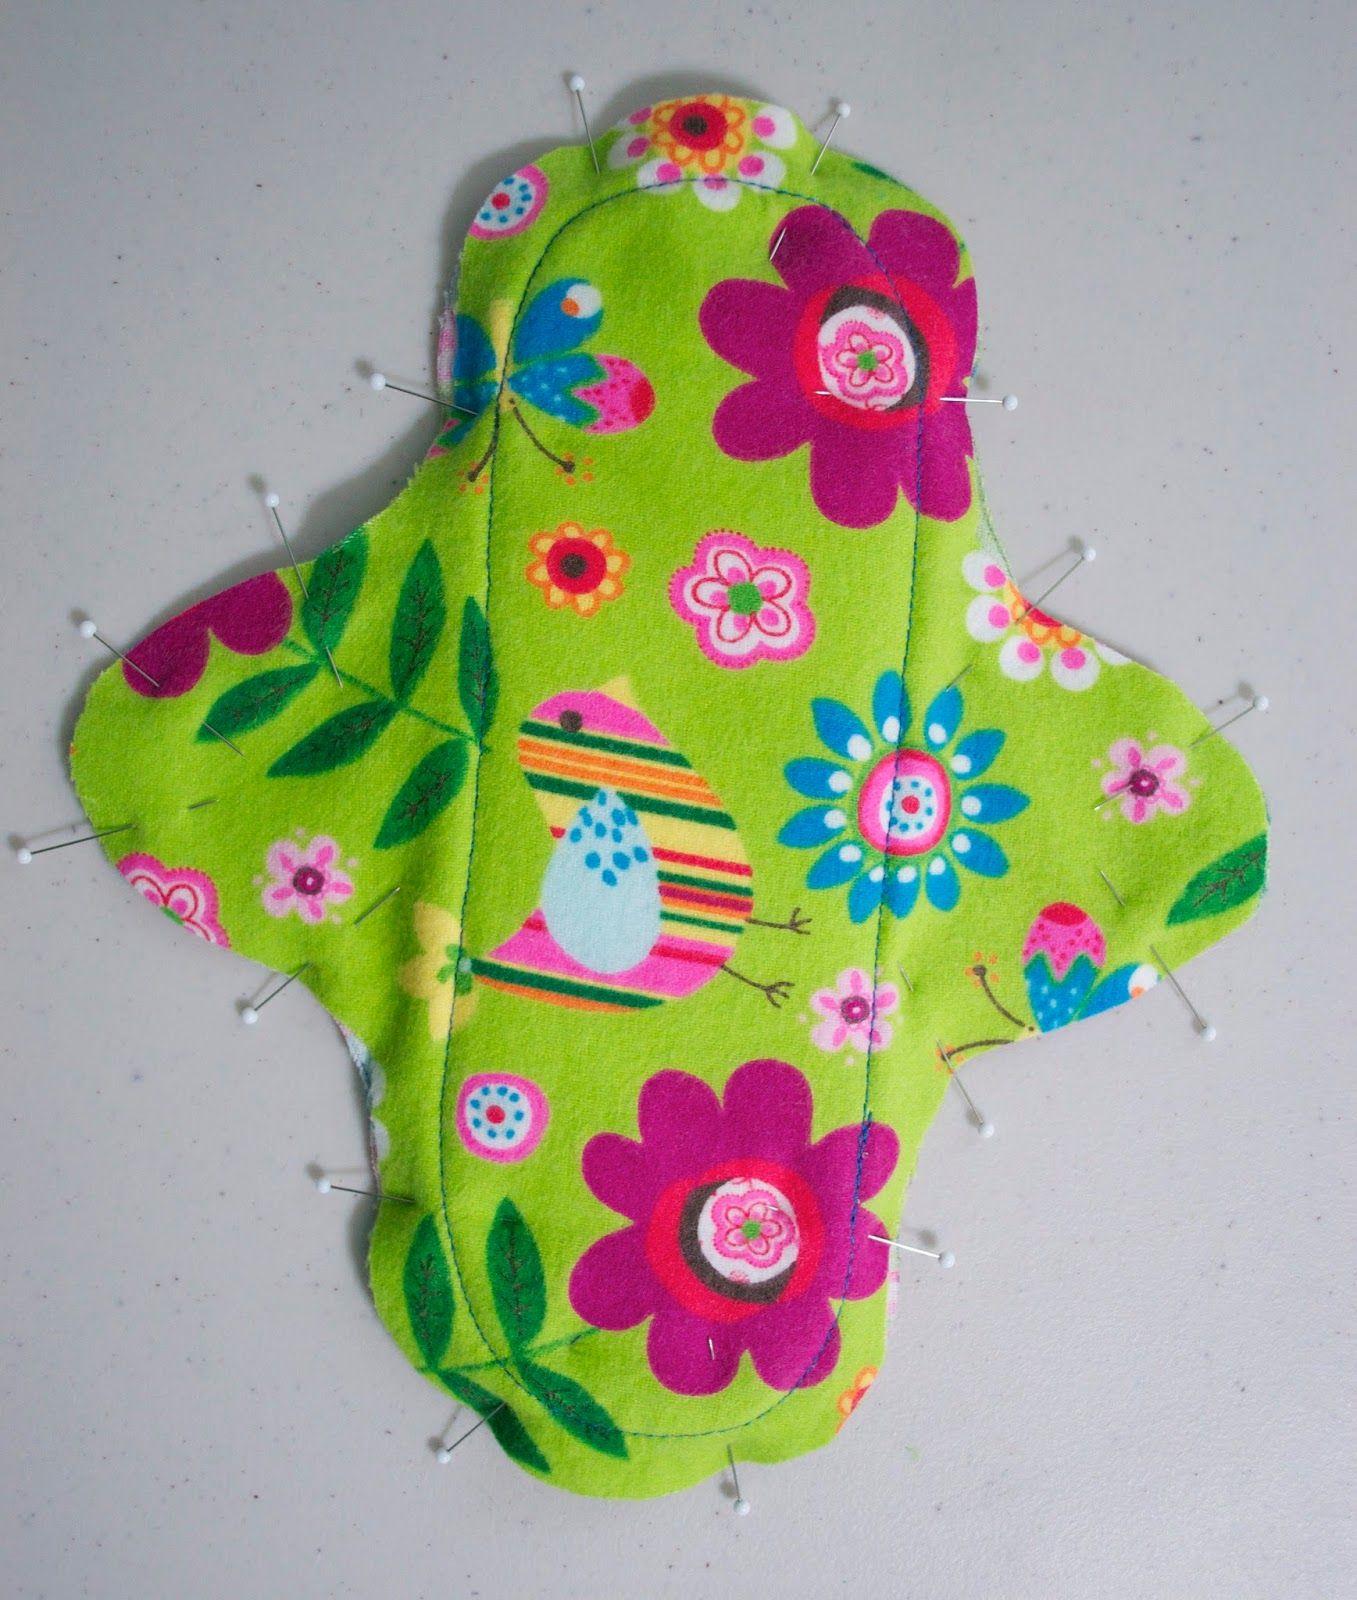 Diy Cloth Pads Tutorial: Sew In Peace: Feminine Cloth Pad Tutorial Interesting